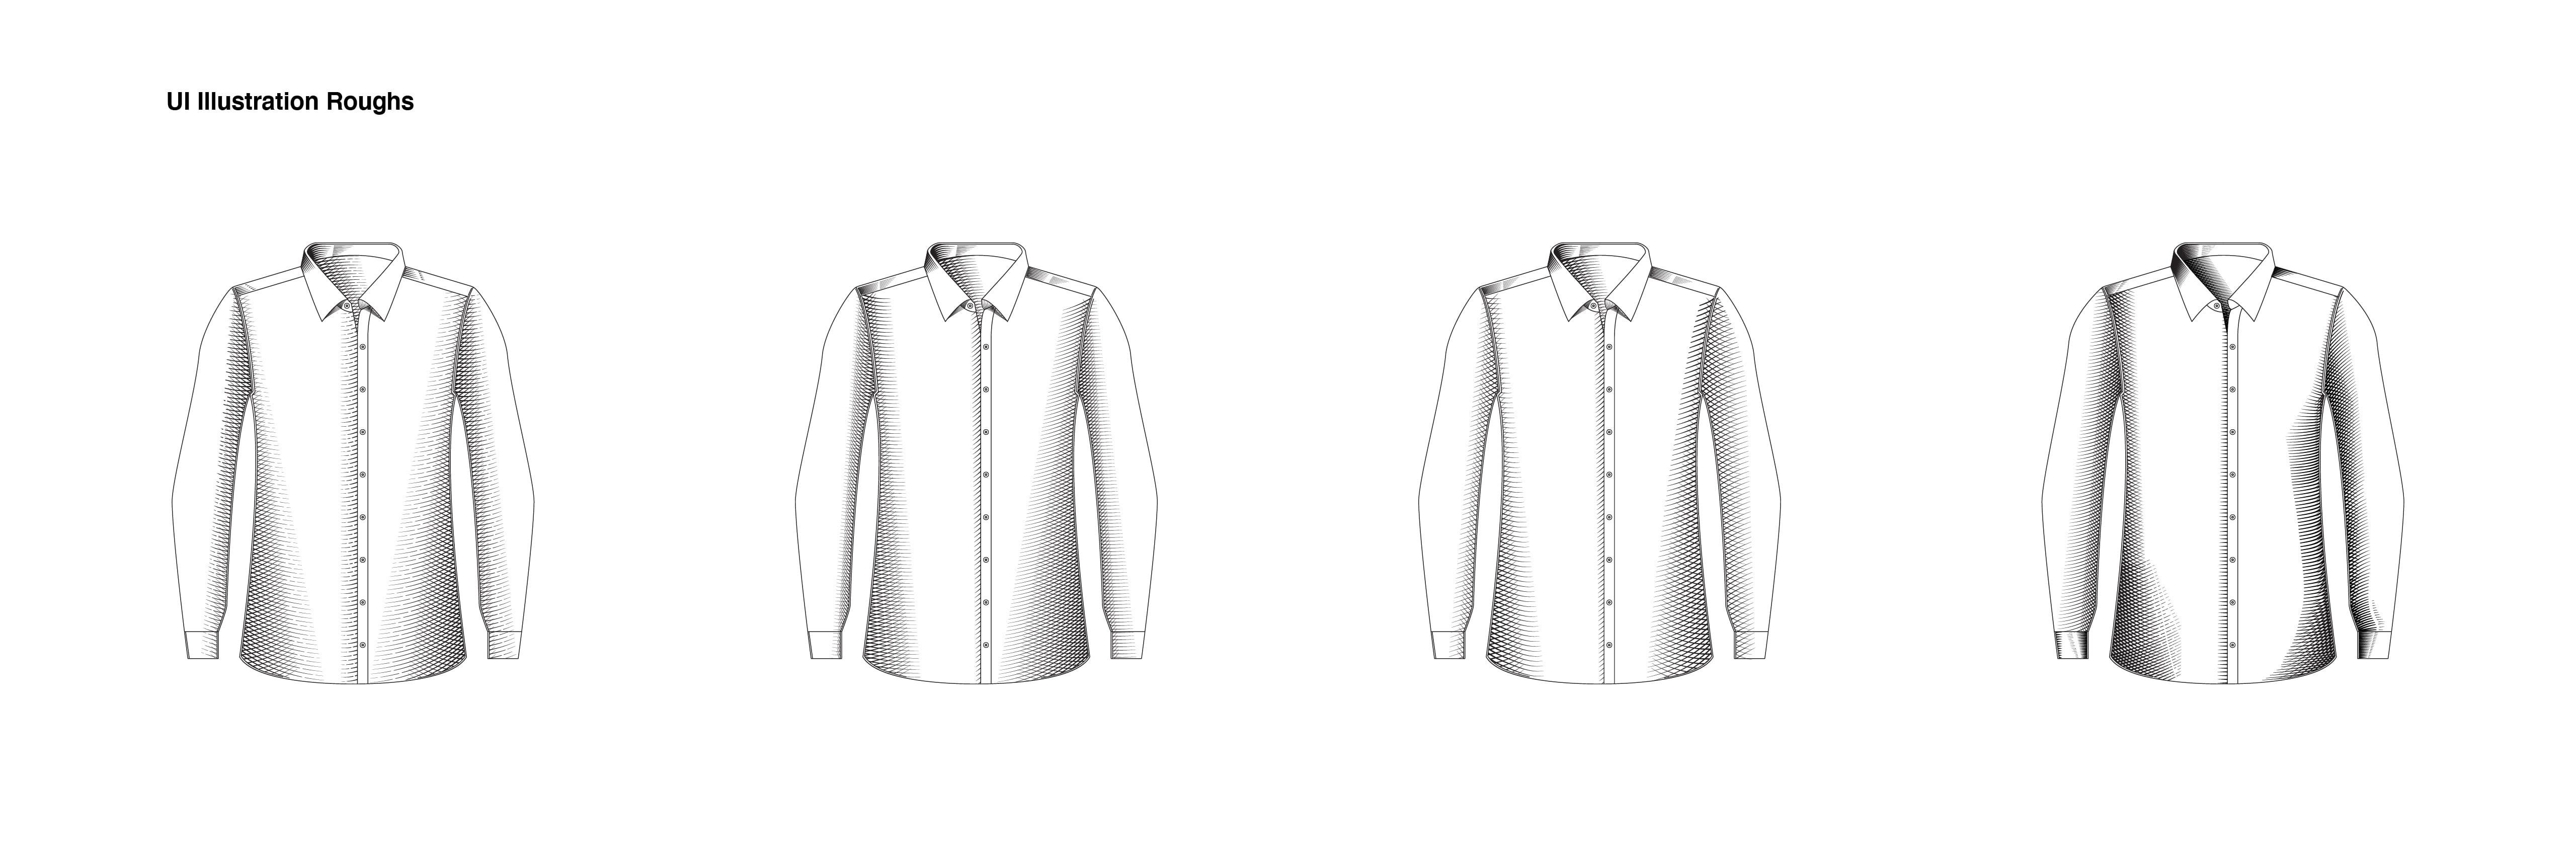 UI Illustrations 05 Shirts@2x-100